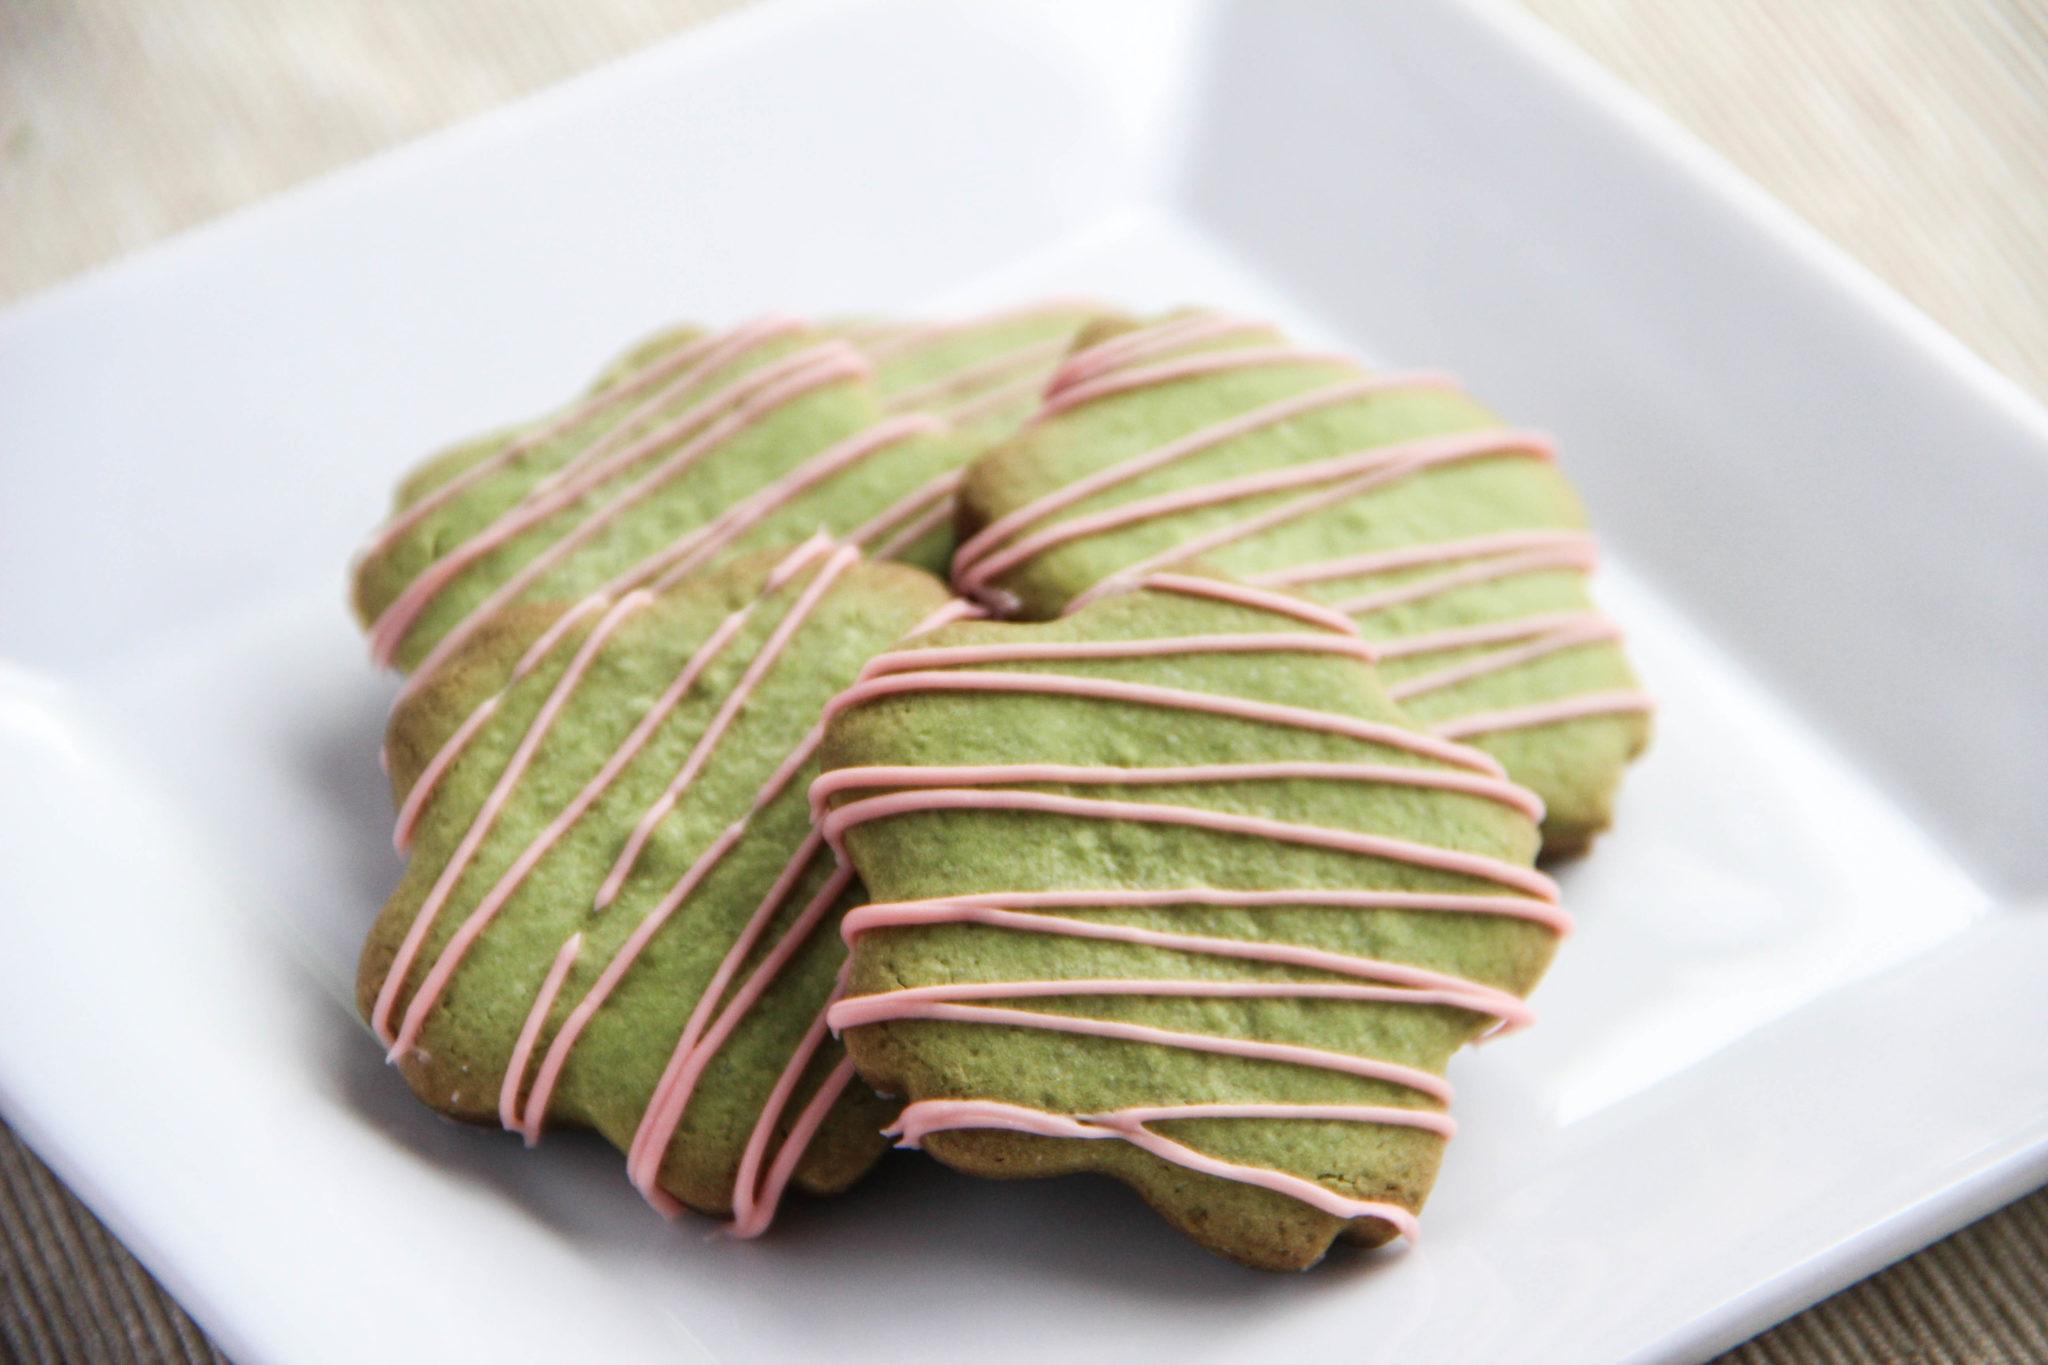 Green Tea Cookies Recipe